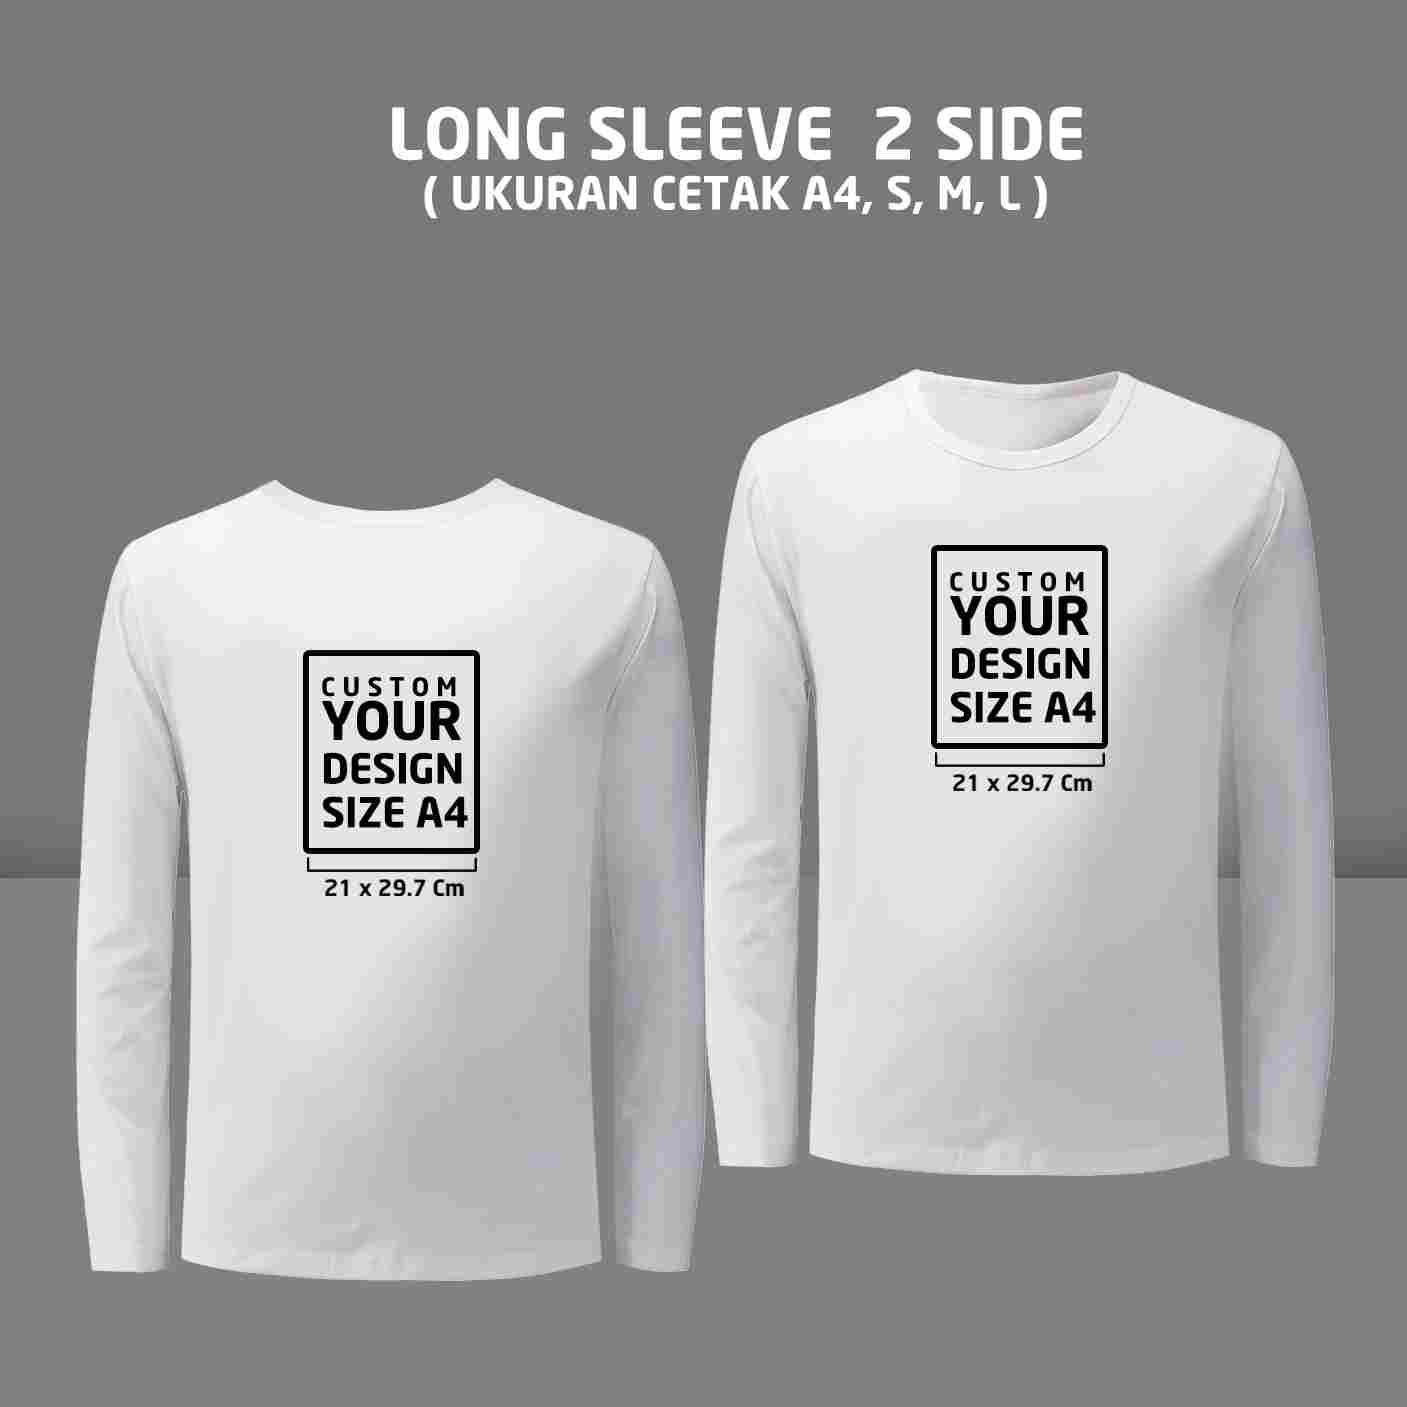 T-shirt Long Sleeve Custom 2 Side ( S, M, L )